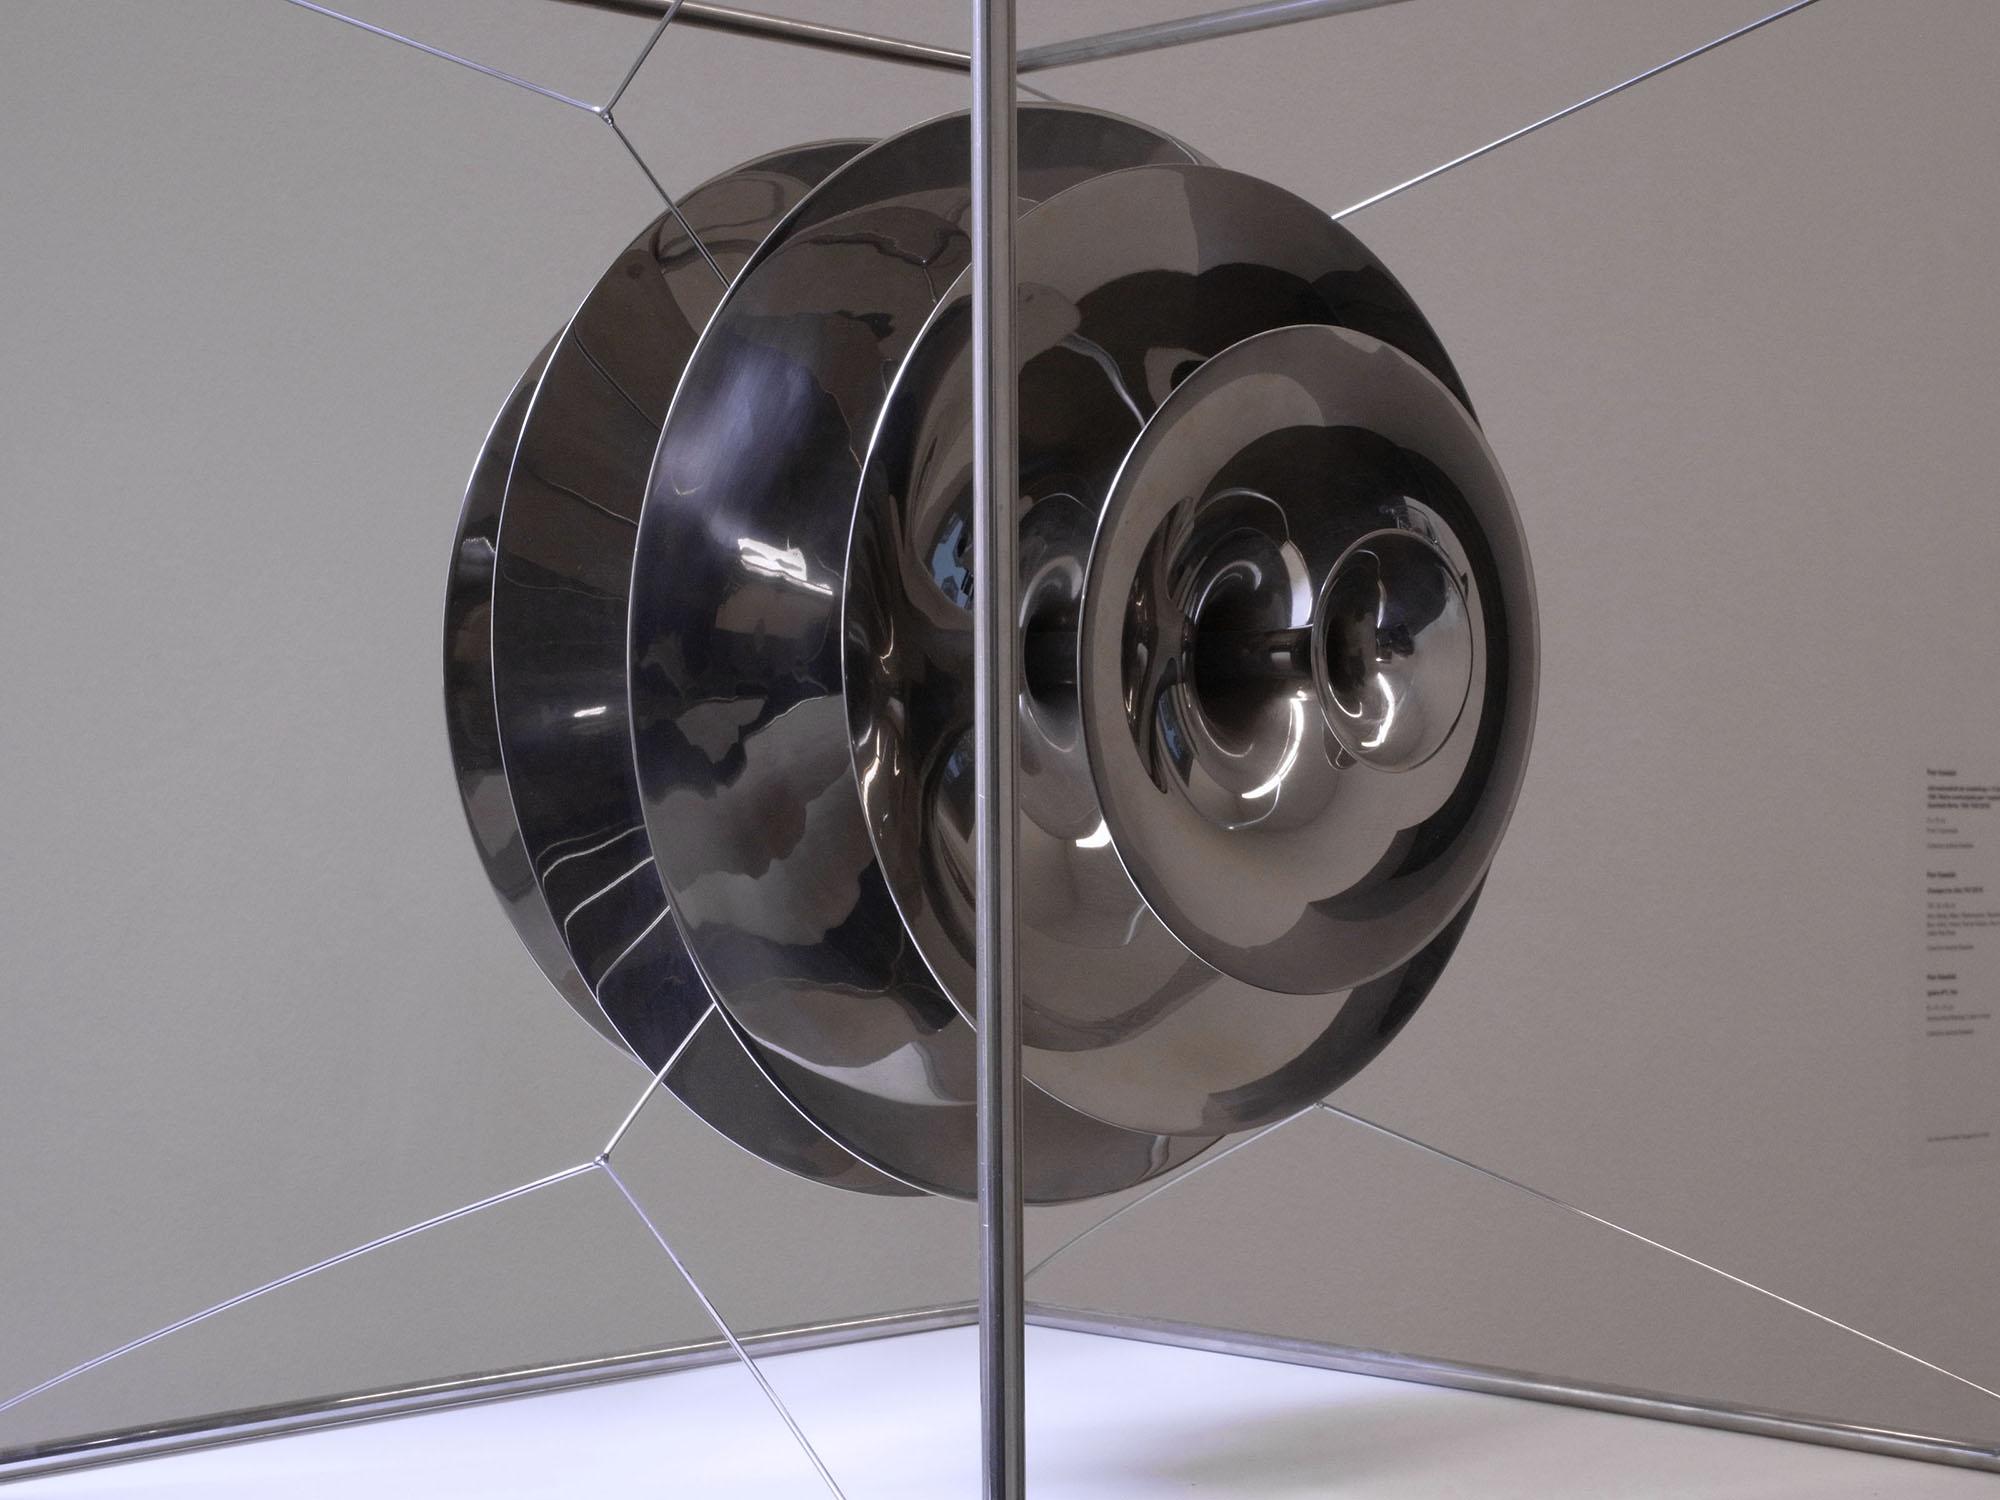 kowalski-1968-sphere-2015